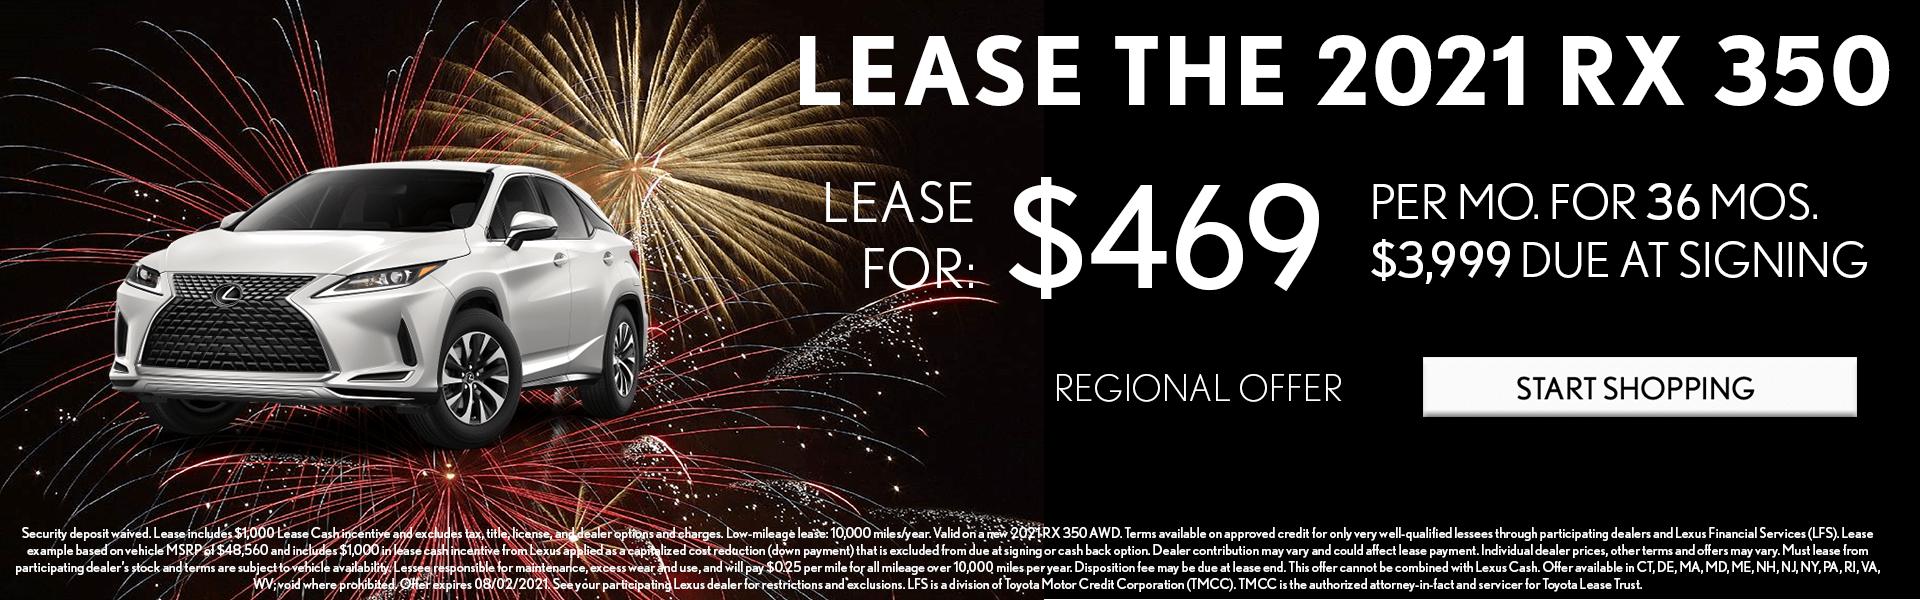 2021 Lexus RX 350 lease offer